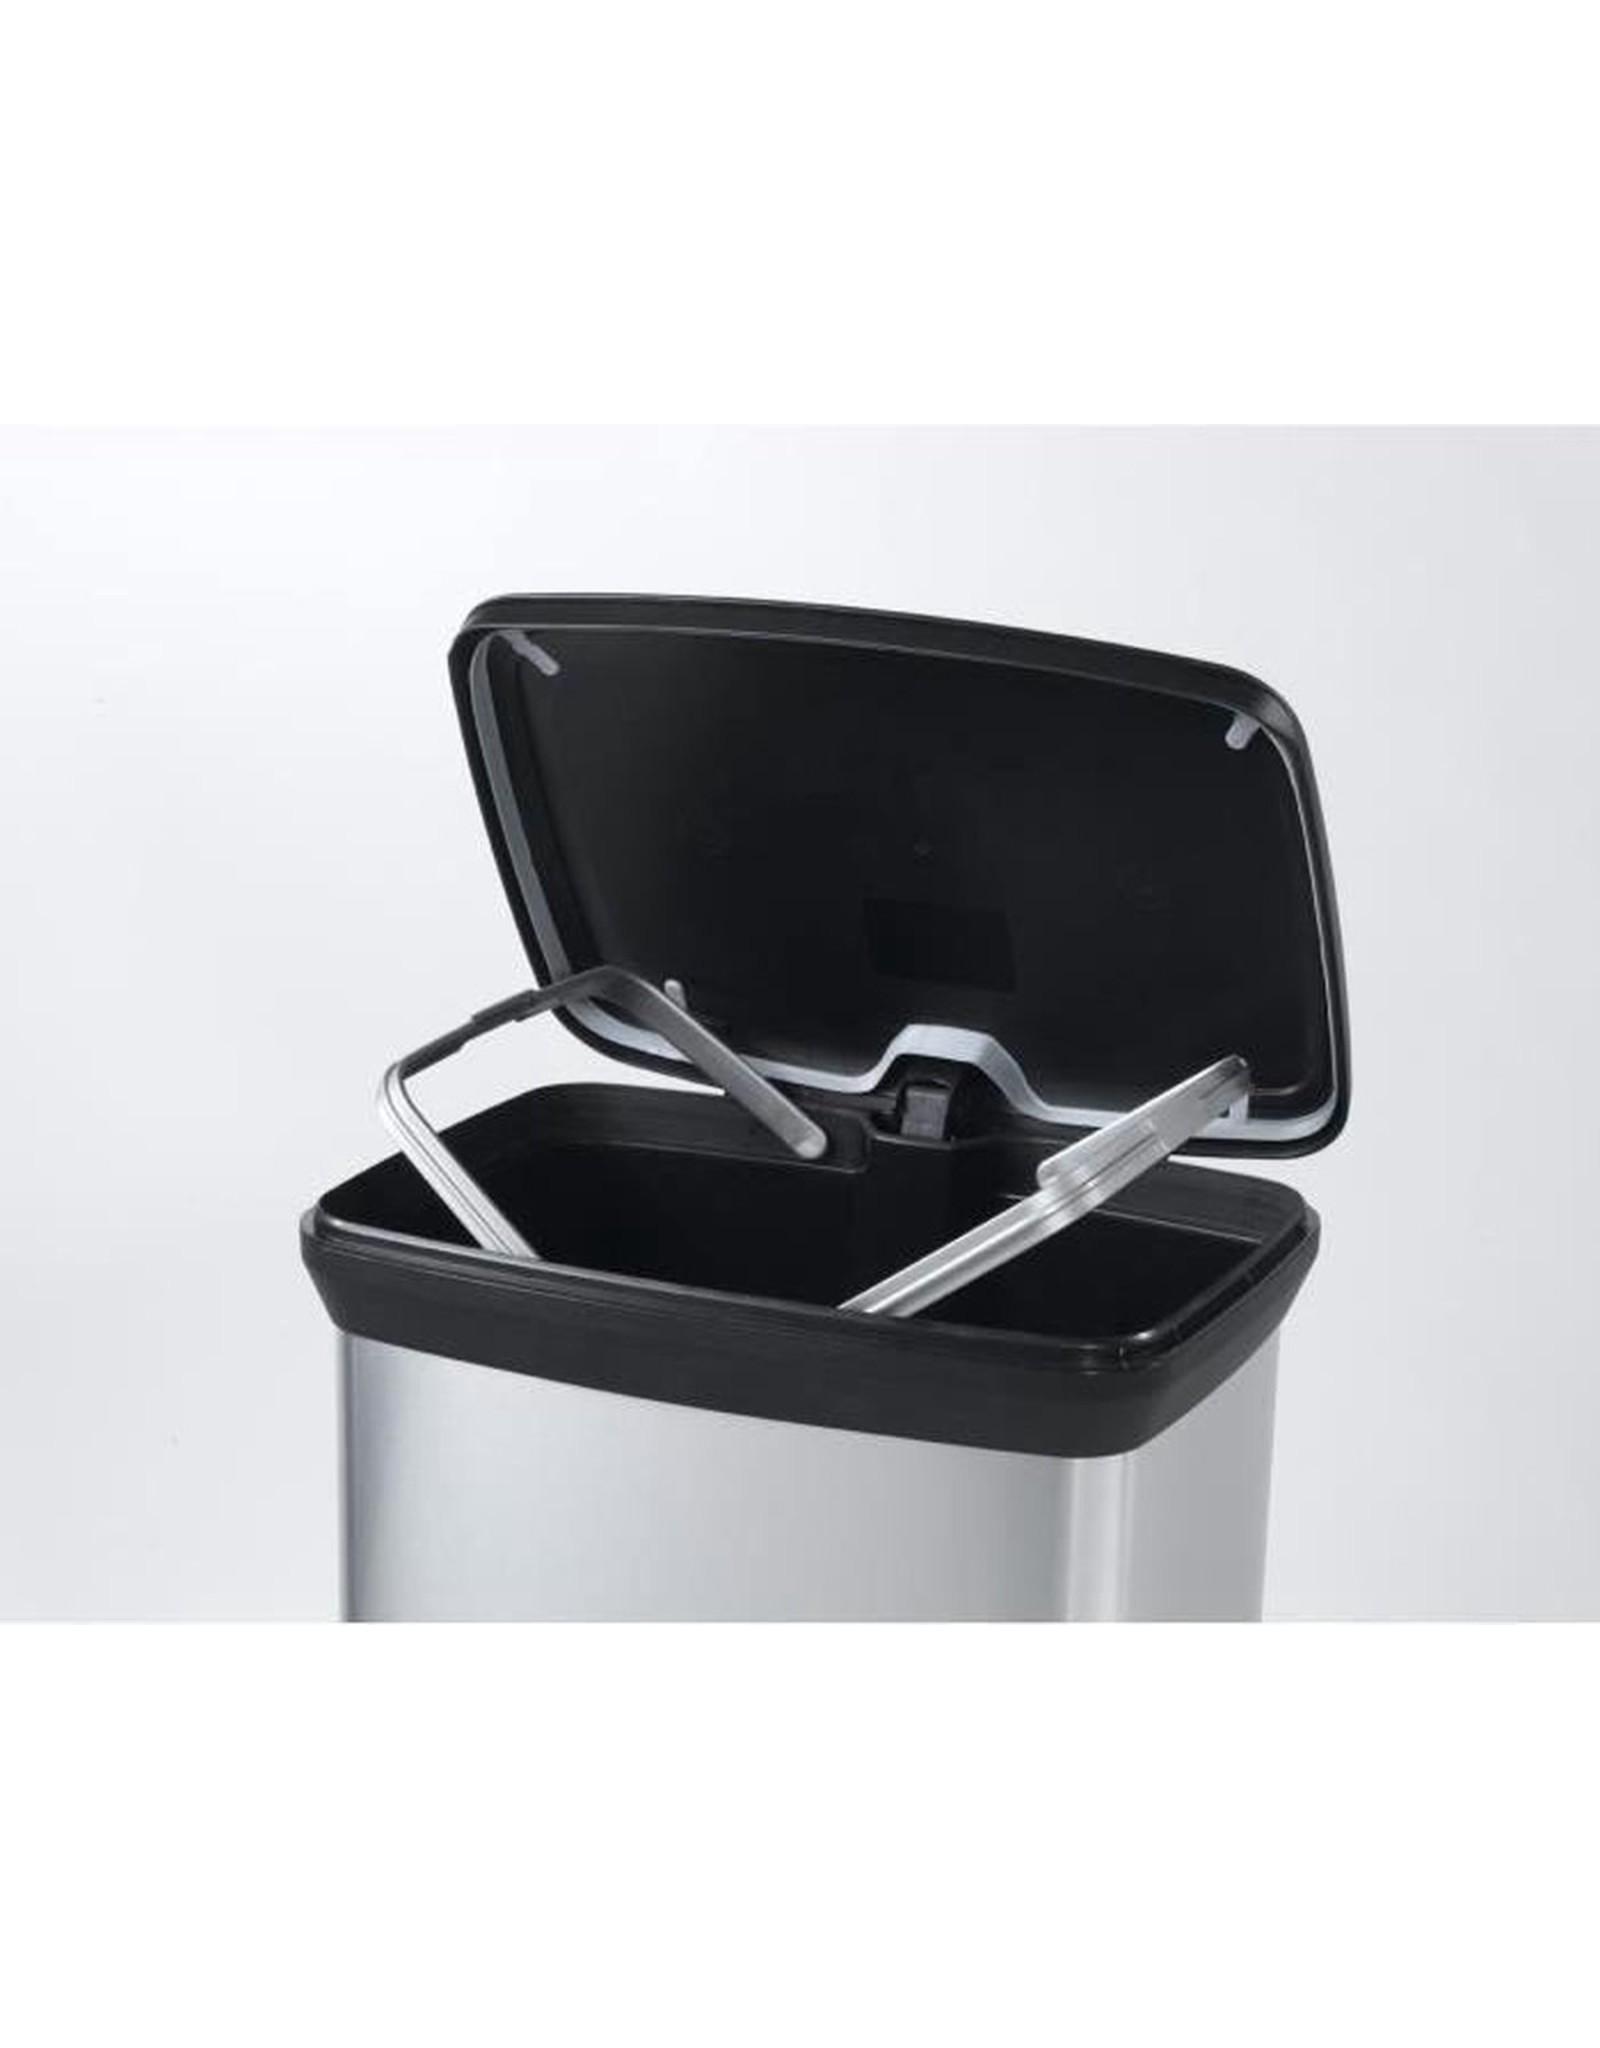 Curver - Decobin Pedaalemmer - Prullenbak - 50 liter - Metallic